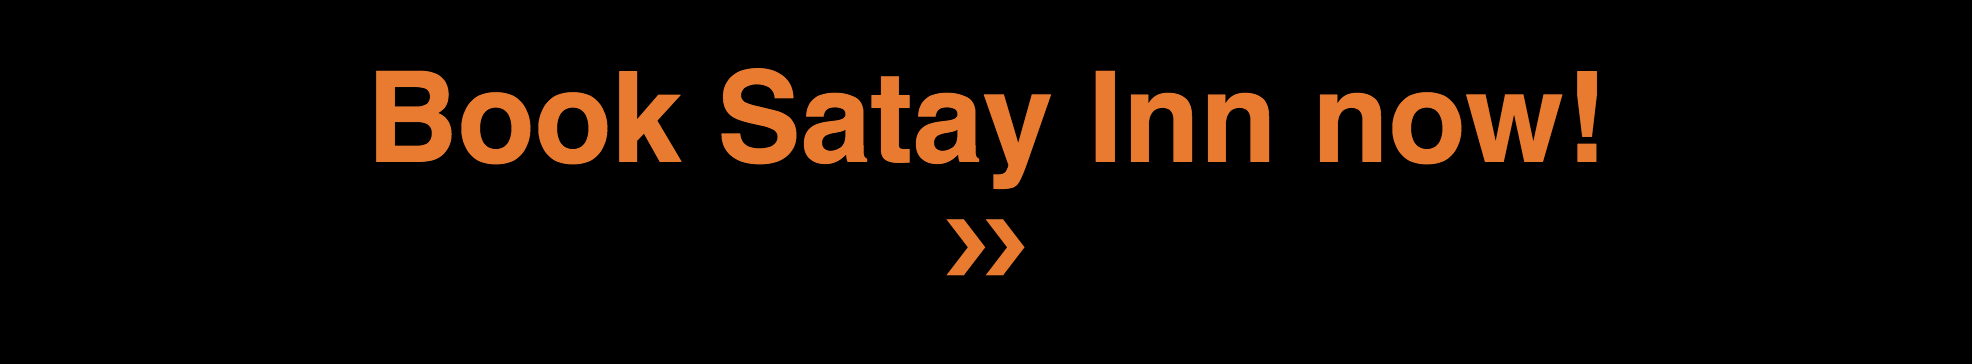 Book Satay Inn Royal Pacific Hotel 沙嗲軒 - 皇家太平洋酒店 - OKiBook Hong Kong - Restaurants, Buffet, Booking, Reviews Deals, Discounts, Dining Promotions 香港,餐廳及預訂,自助餐, 評價,折扣,優惠, 餐飲促銷